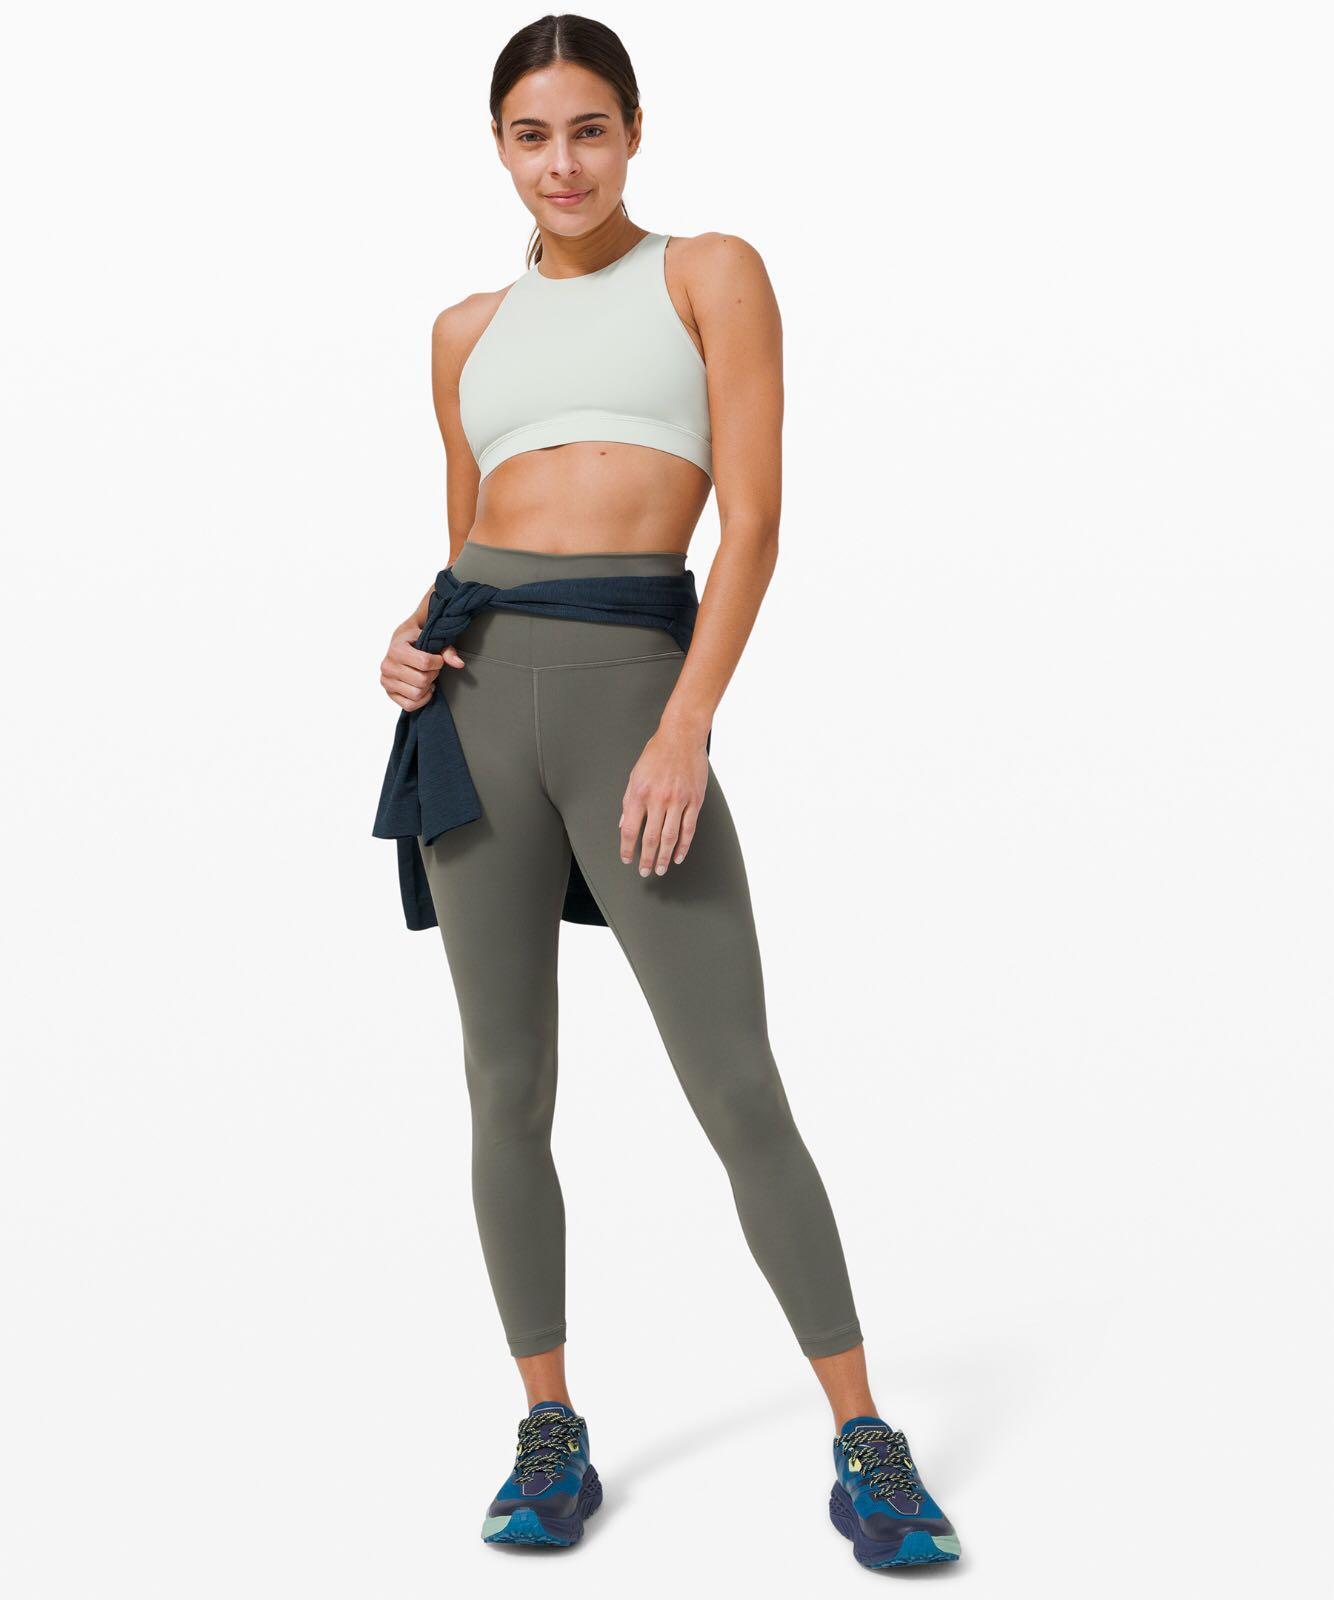 Lululemon wunder train athletic pants PFAS testing